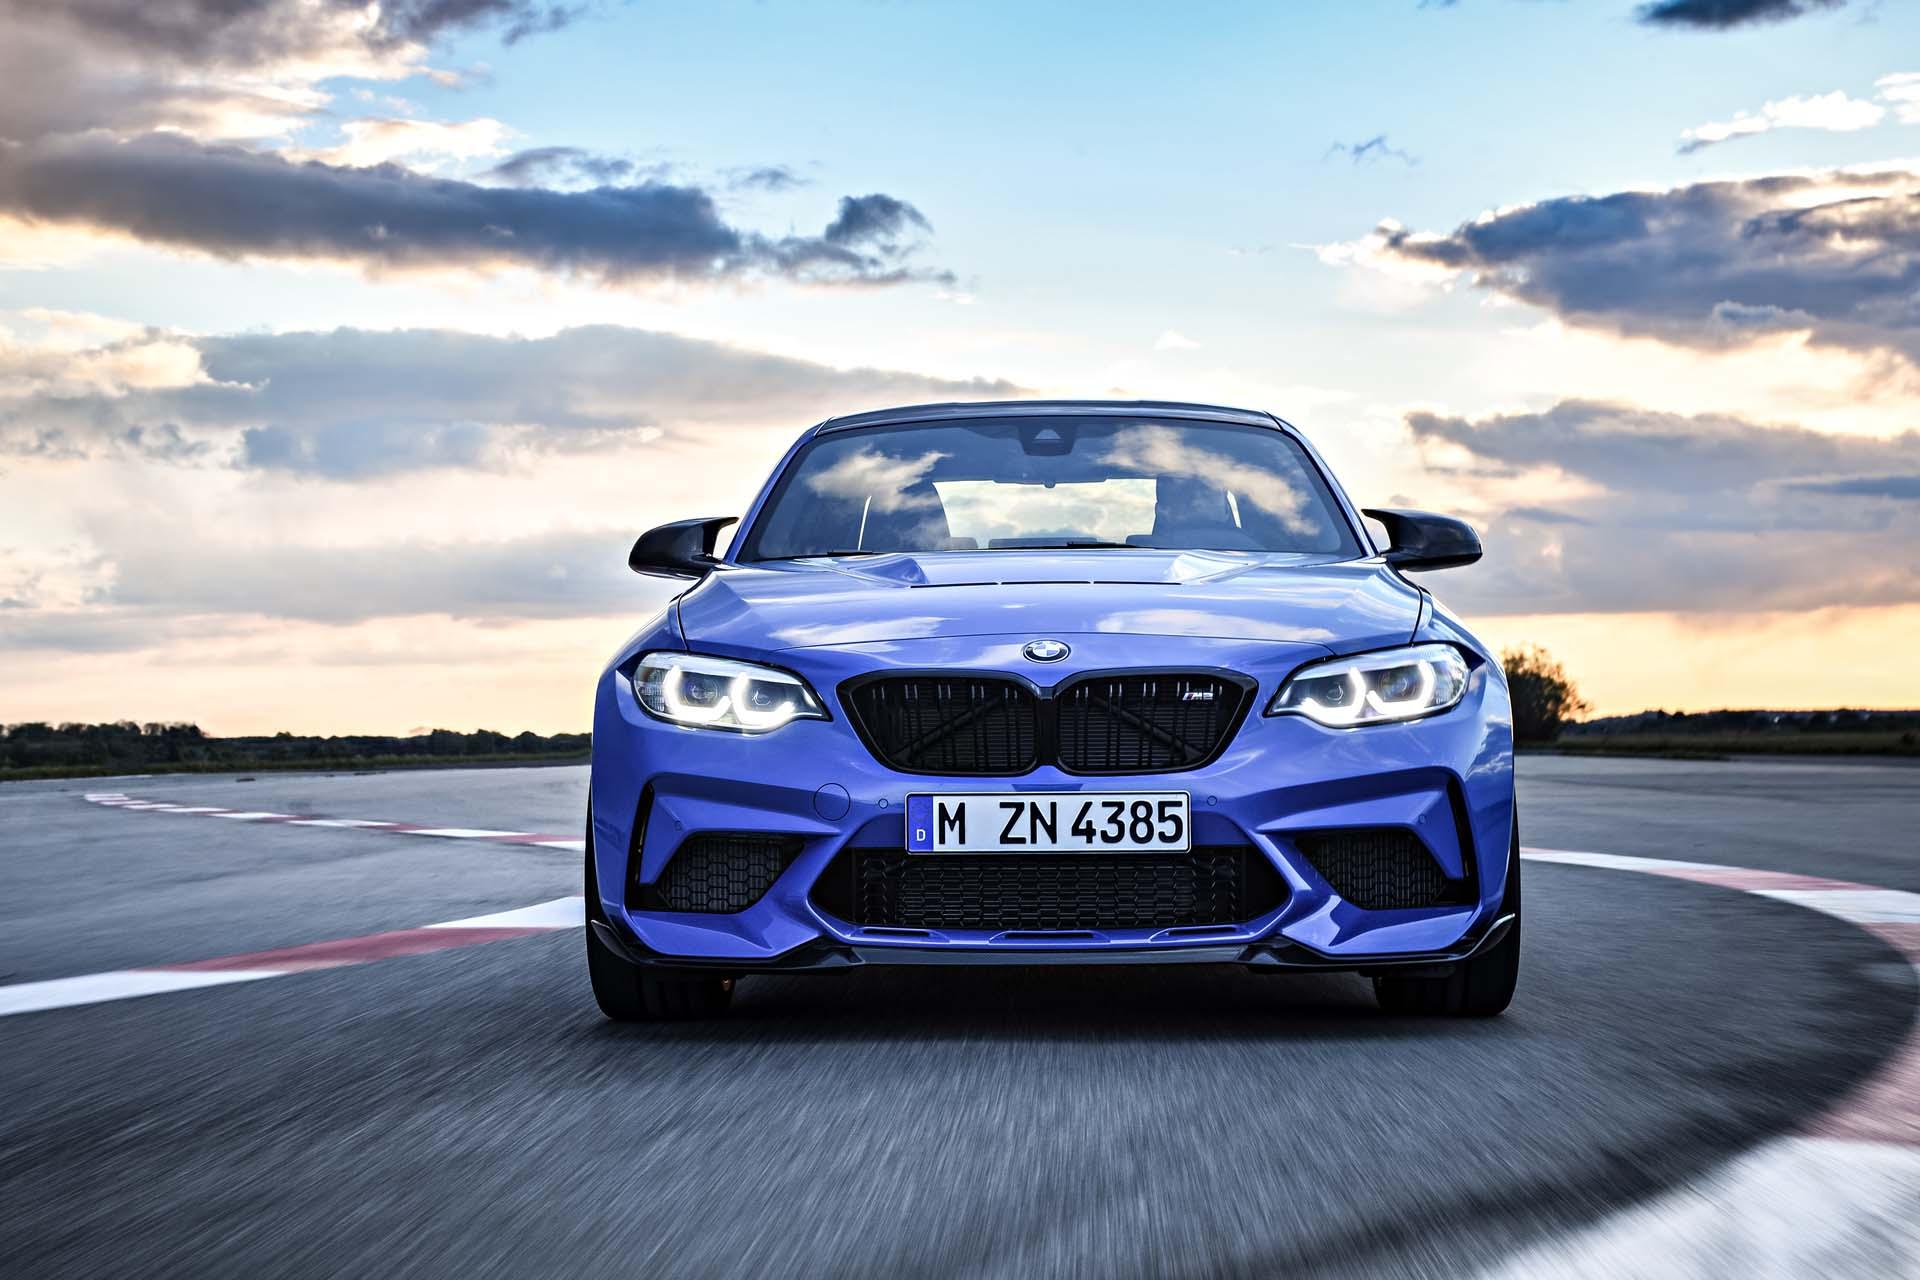 2016 - [BMW] M2 [F87] - Page 11 2020-bmw-2-series_100722773_h